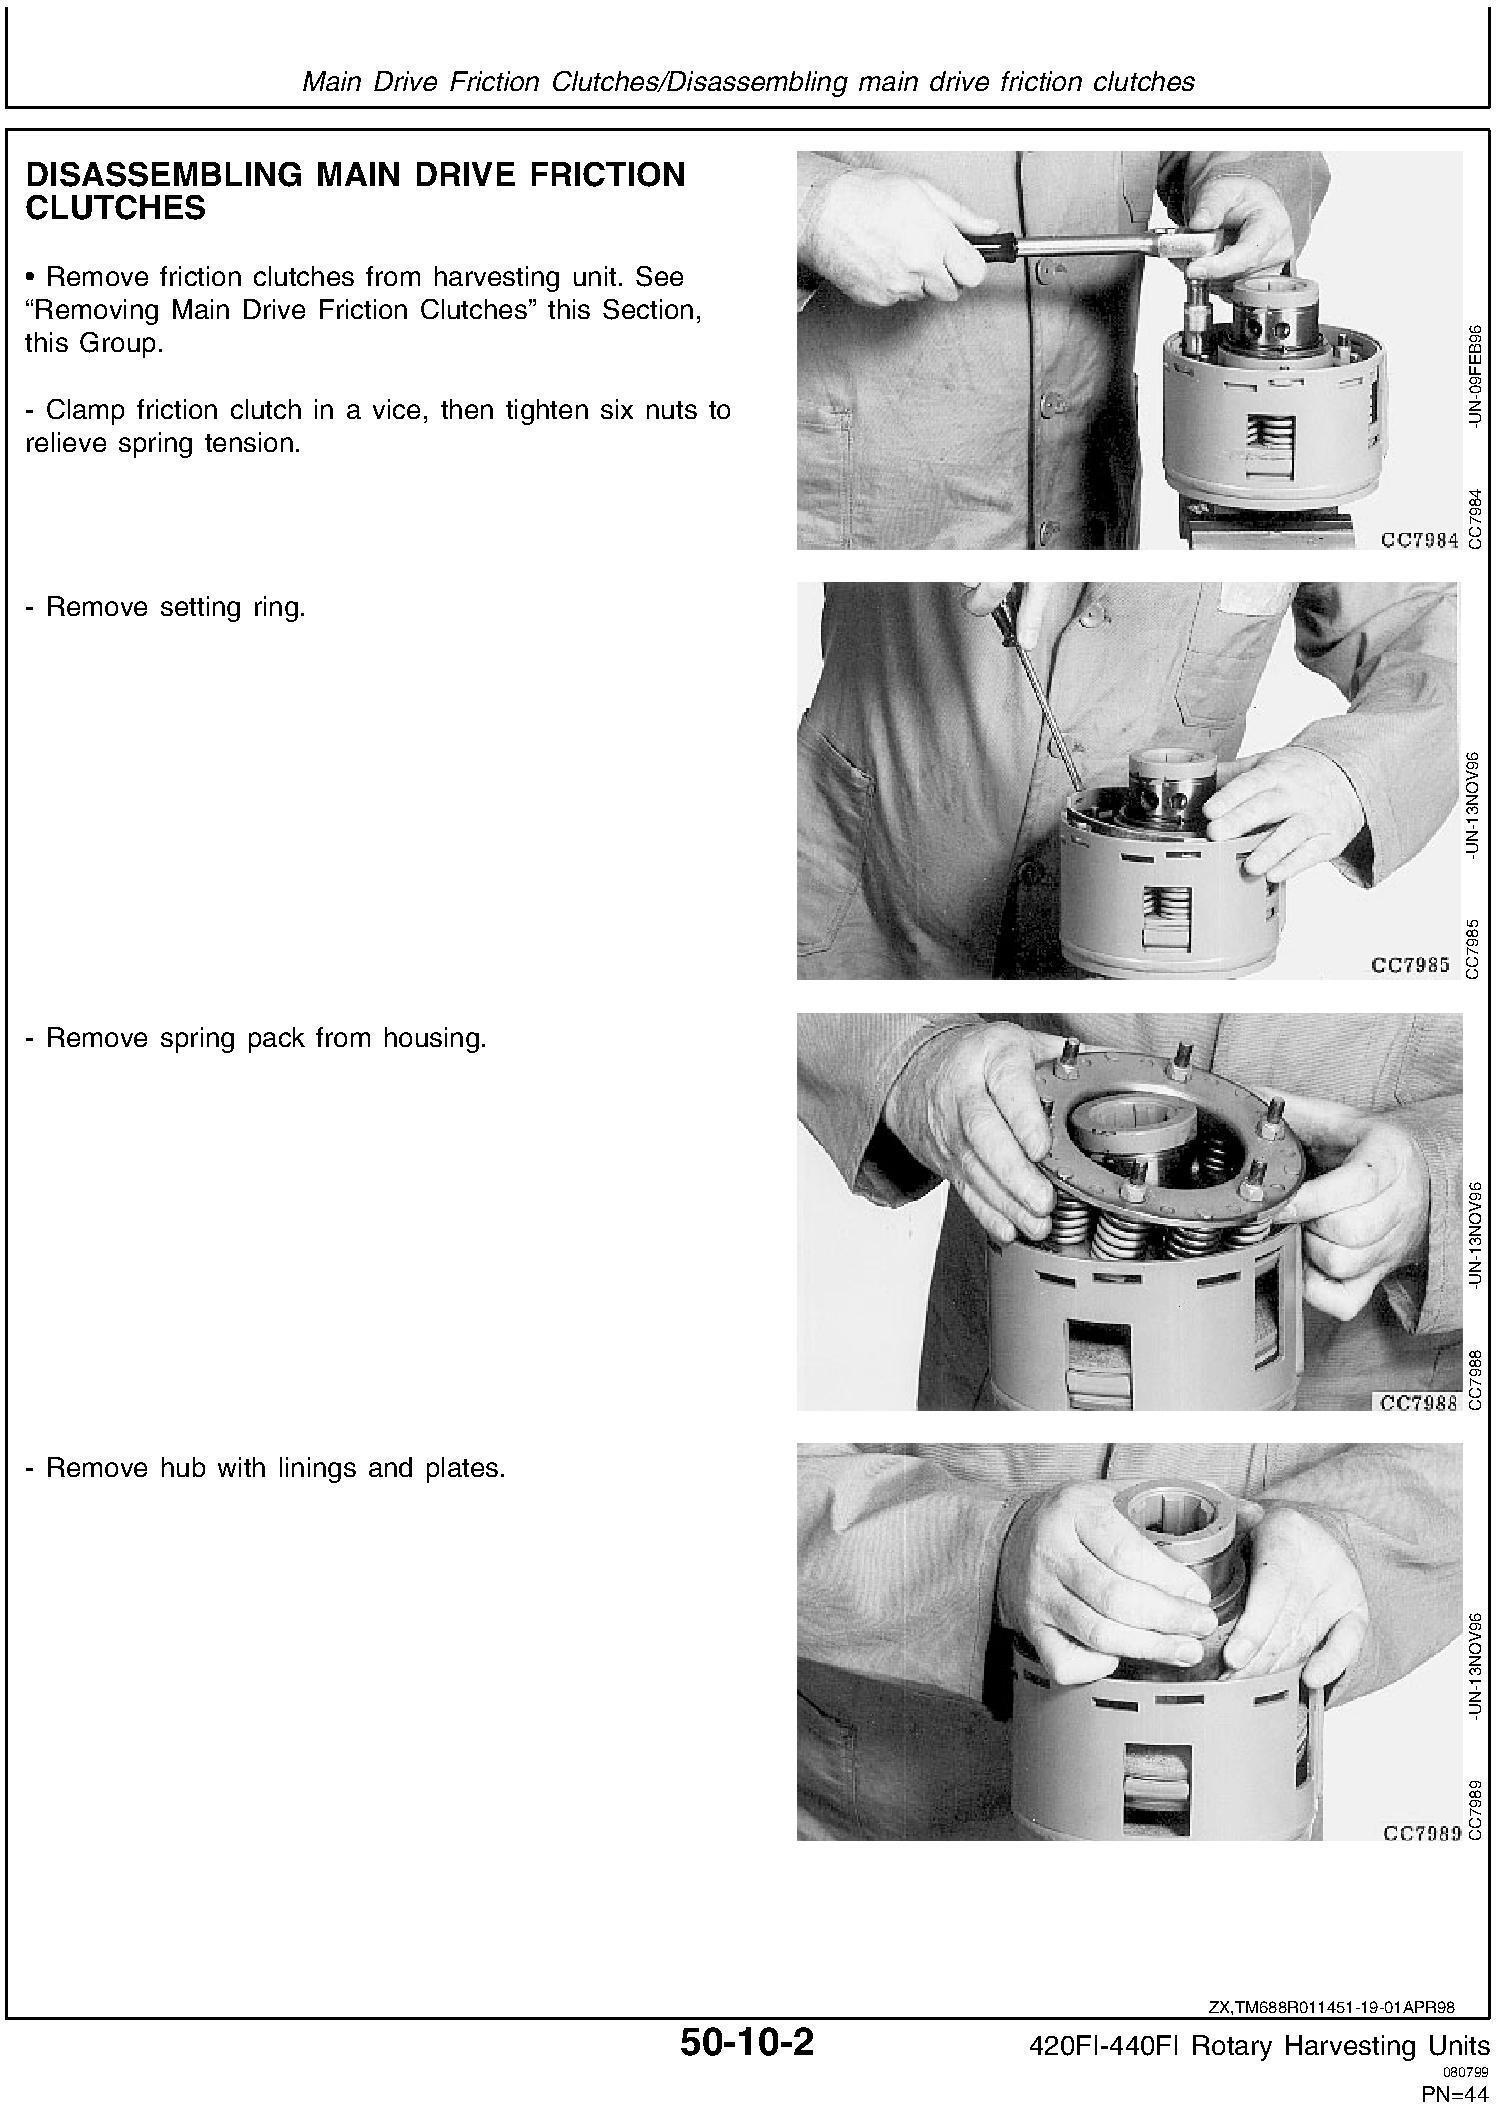 New Holland 420FI, 440FI Rotary Harvesting Headers Service Manual - 3